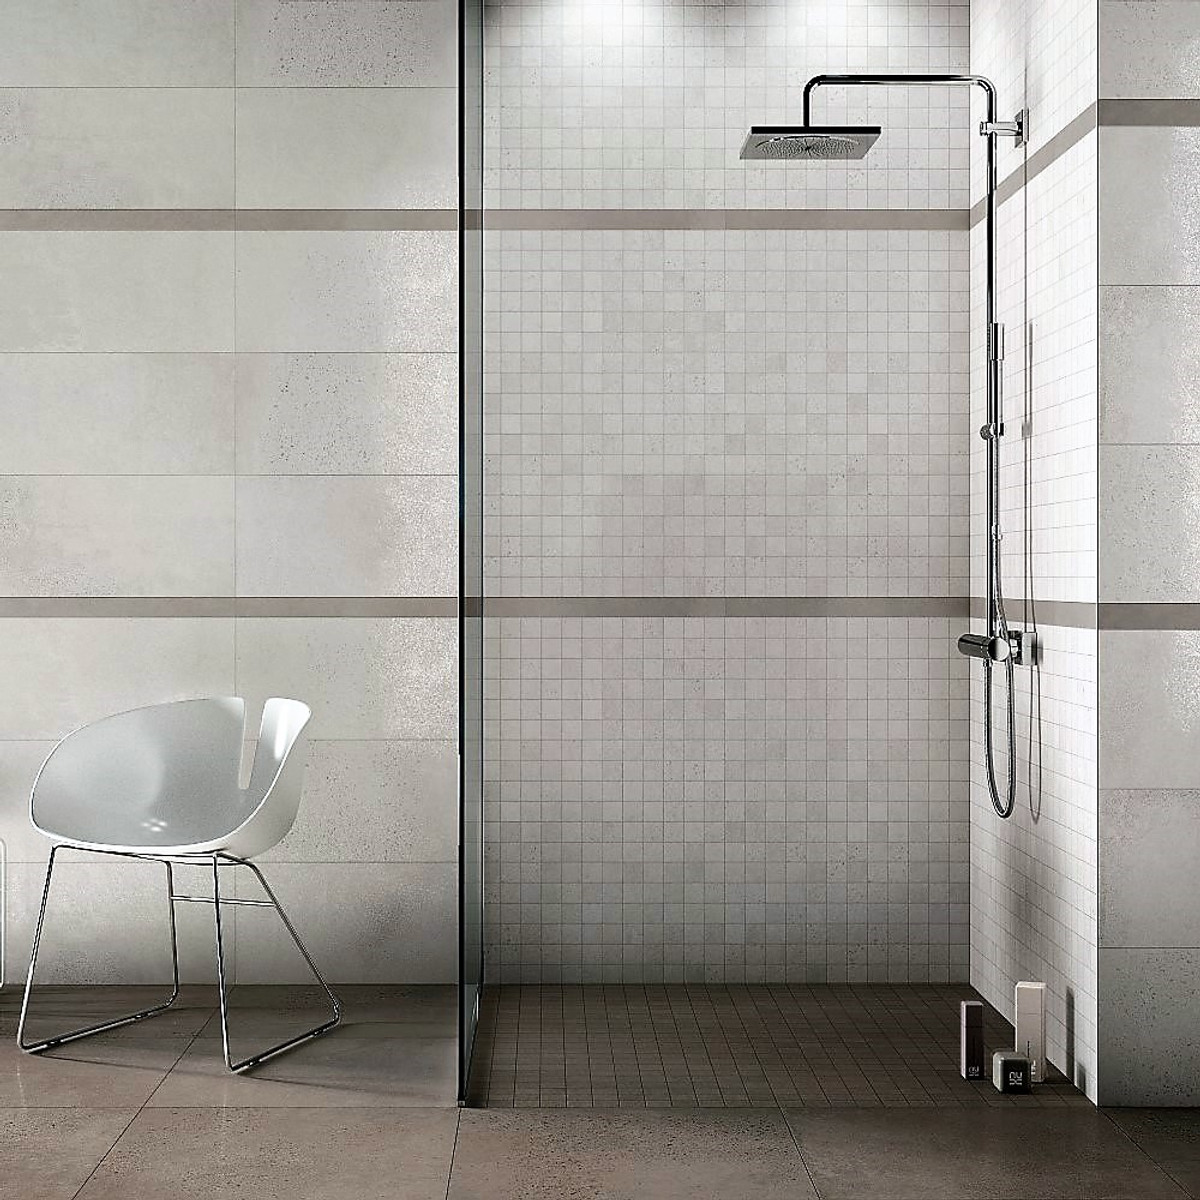 Downtown Ivory 30x60 + Downtown Ivory Mosaic 30x30 Wet Rom Bathroom Setting